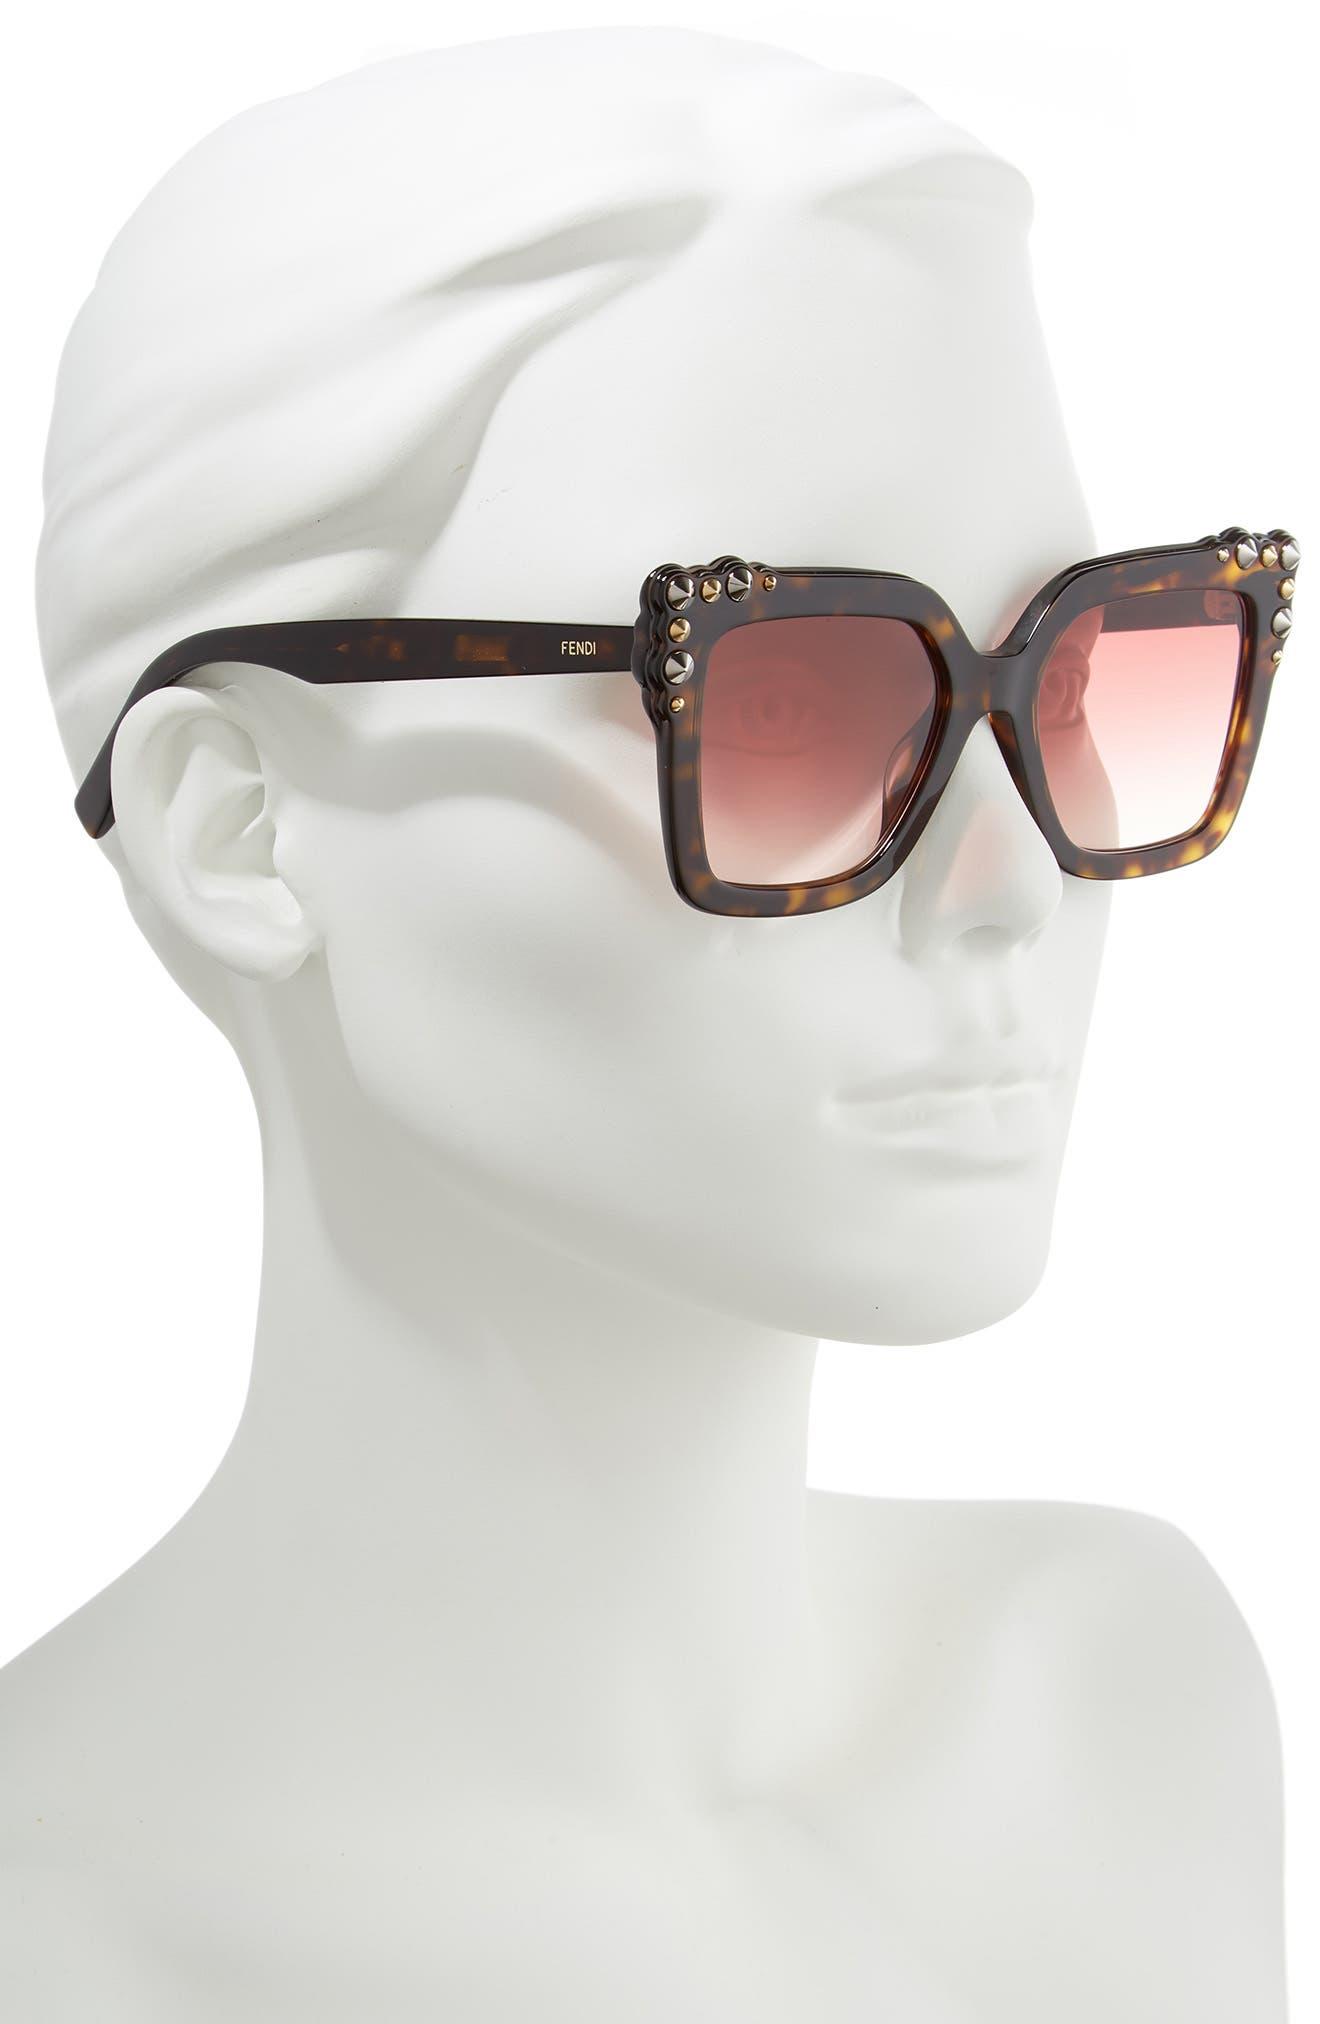 52mm Gradient Cat Eye Sunglasses,                             Alternate thumbnail 2, color,                             DARK HAVANA